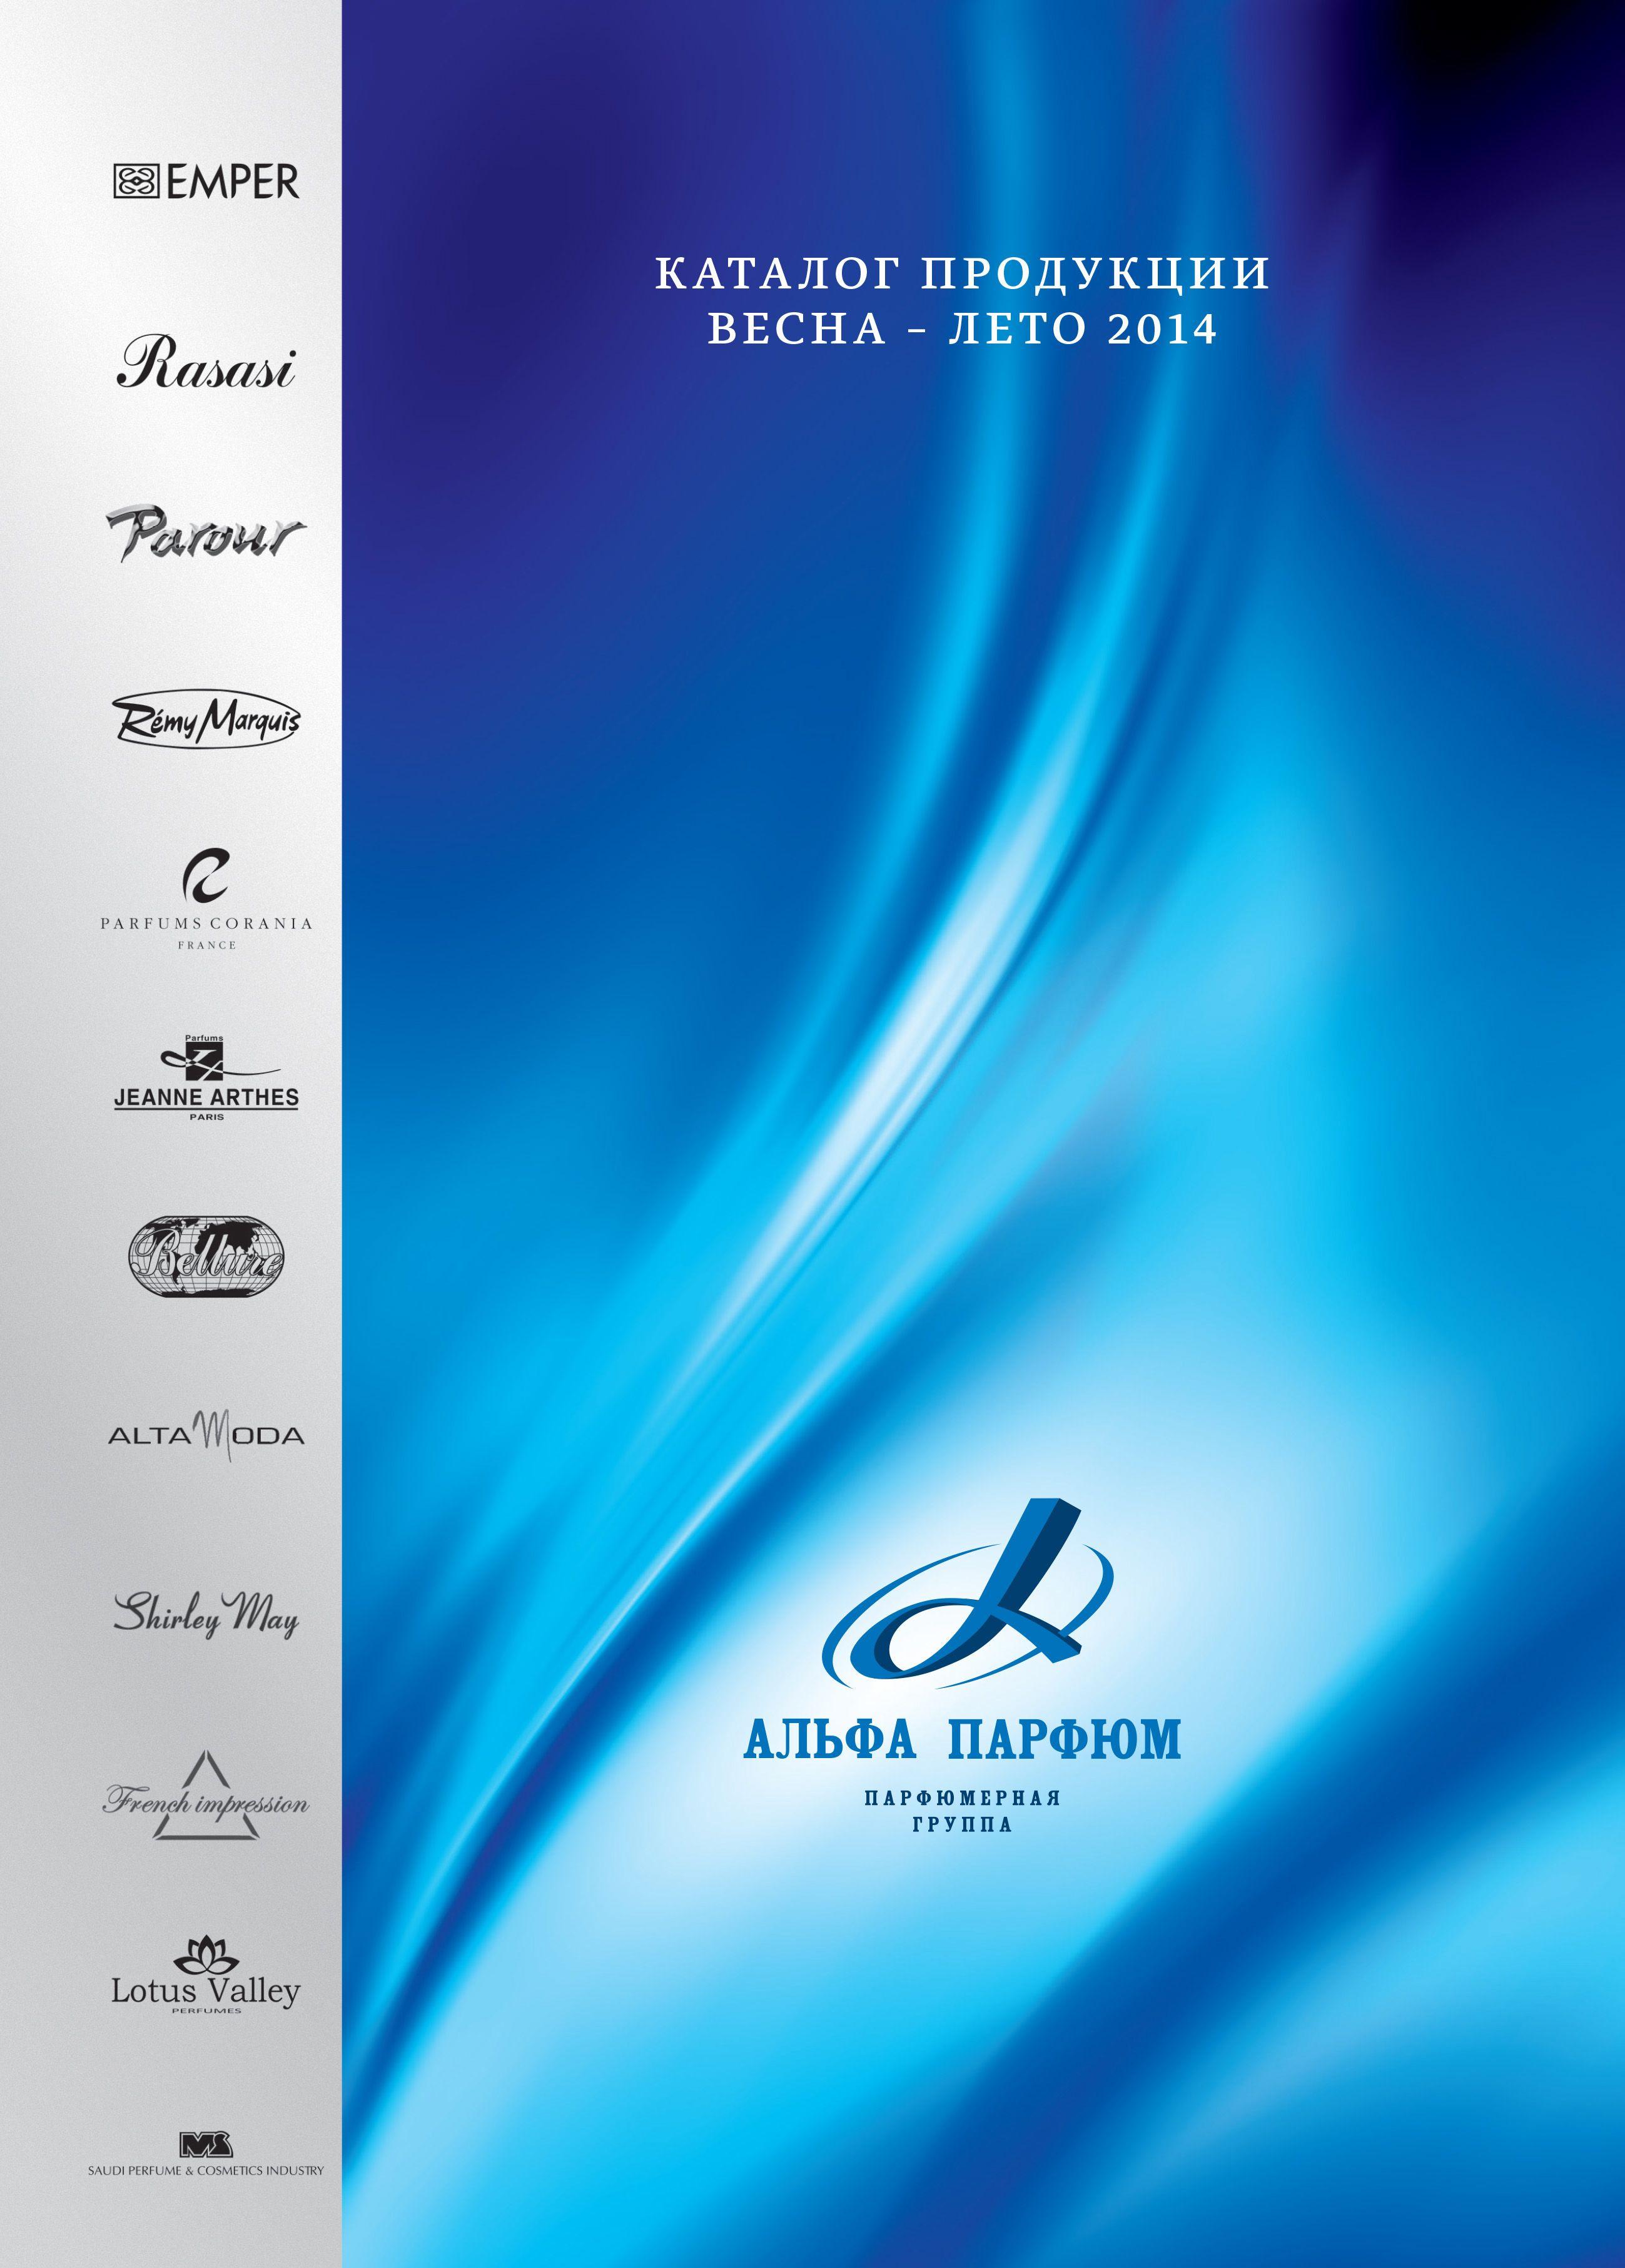 ра групп парфюмерия каталог